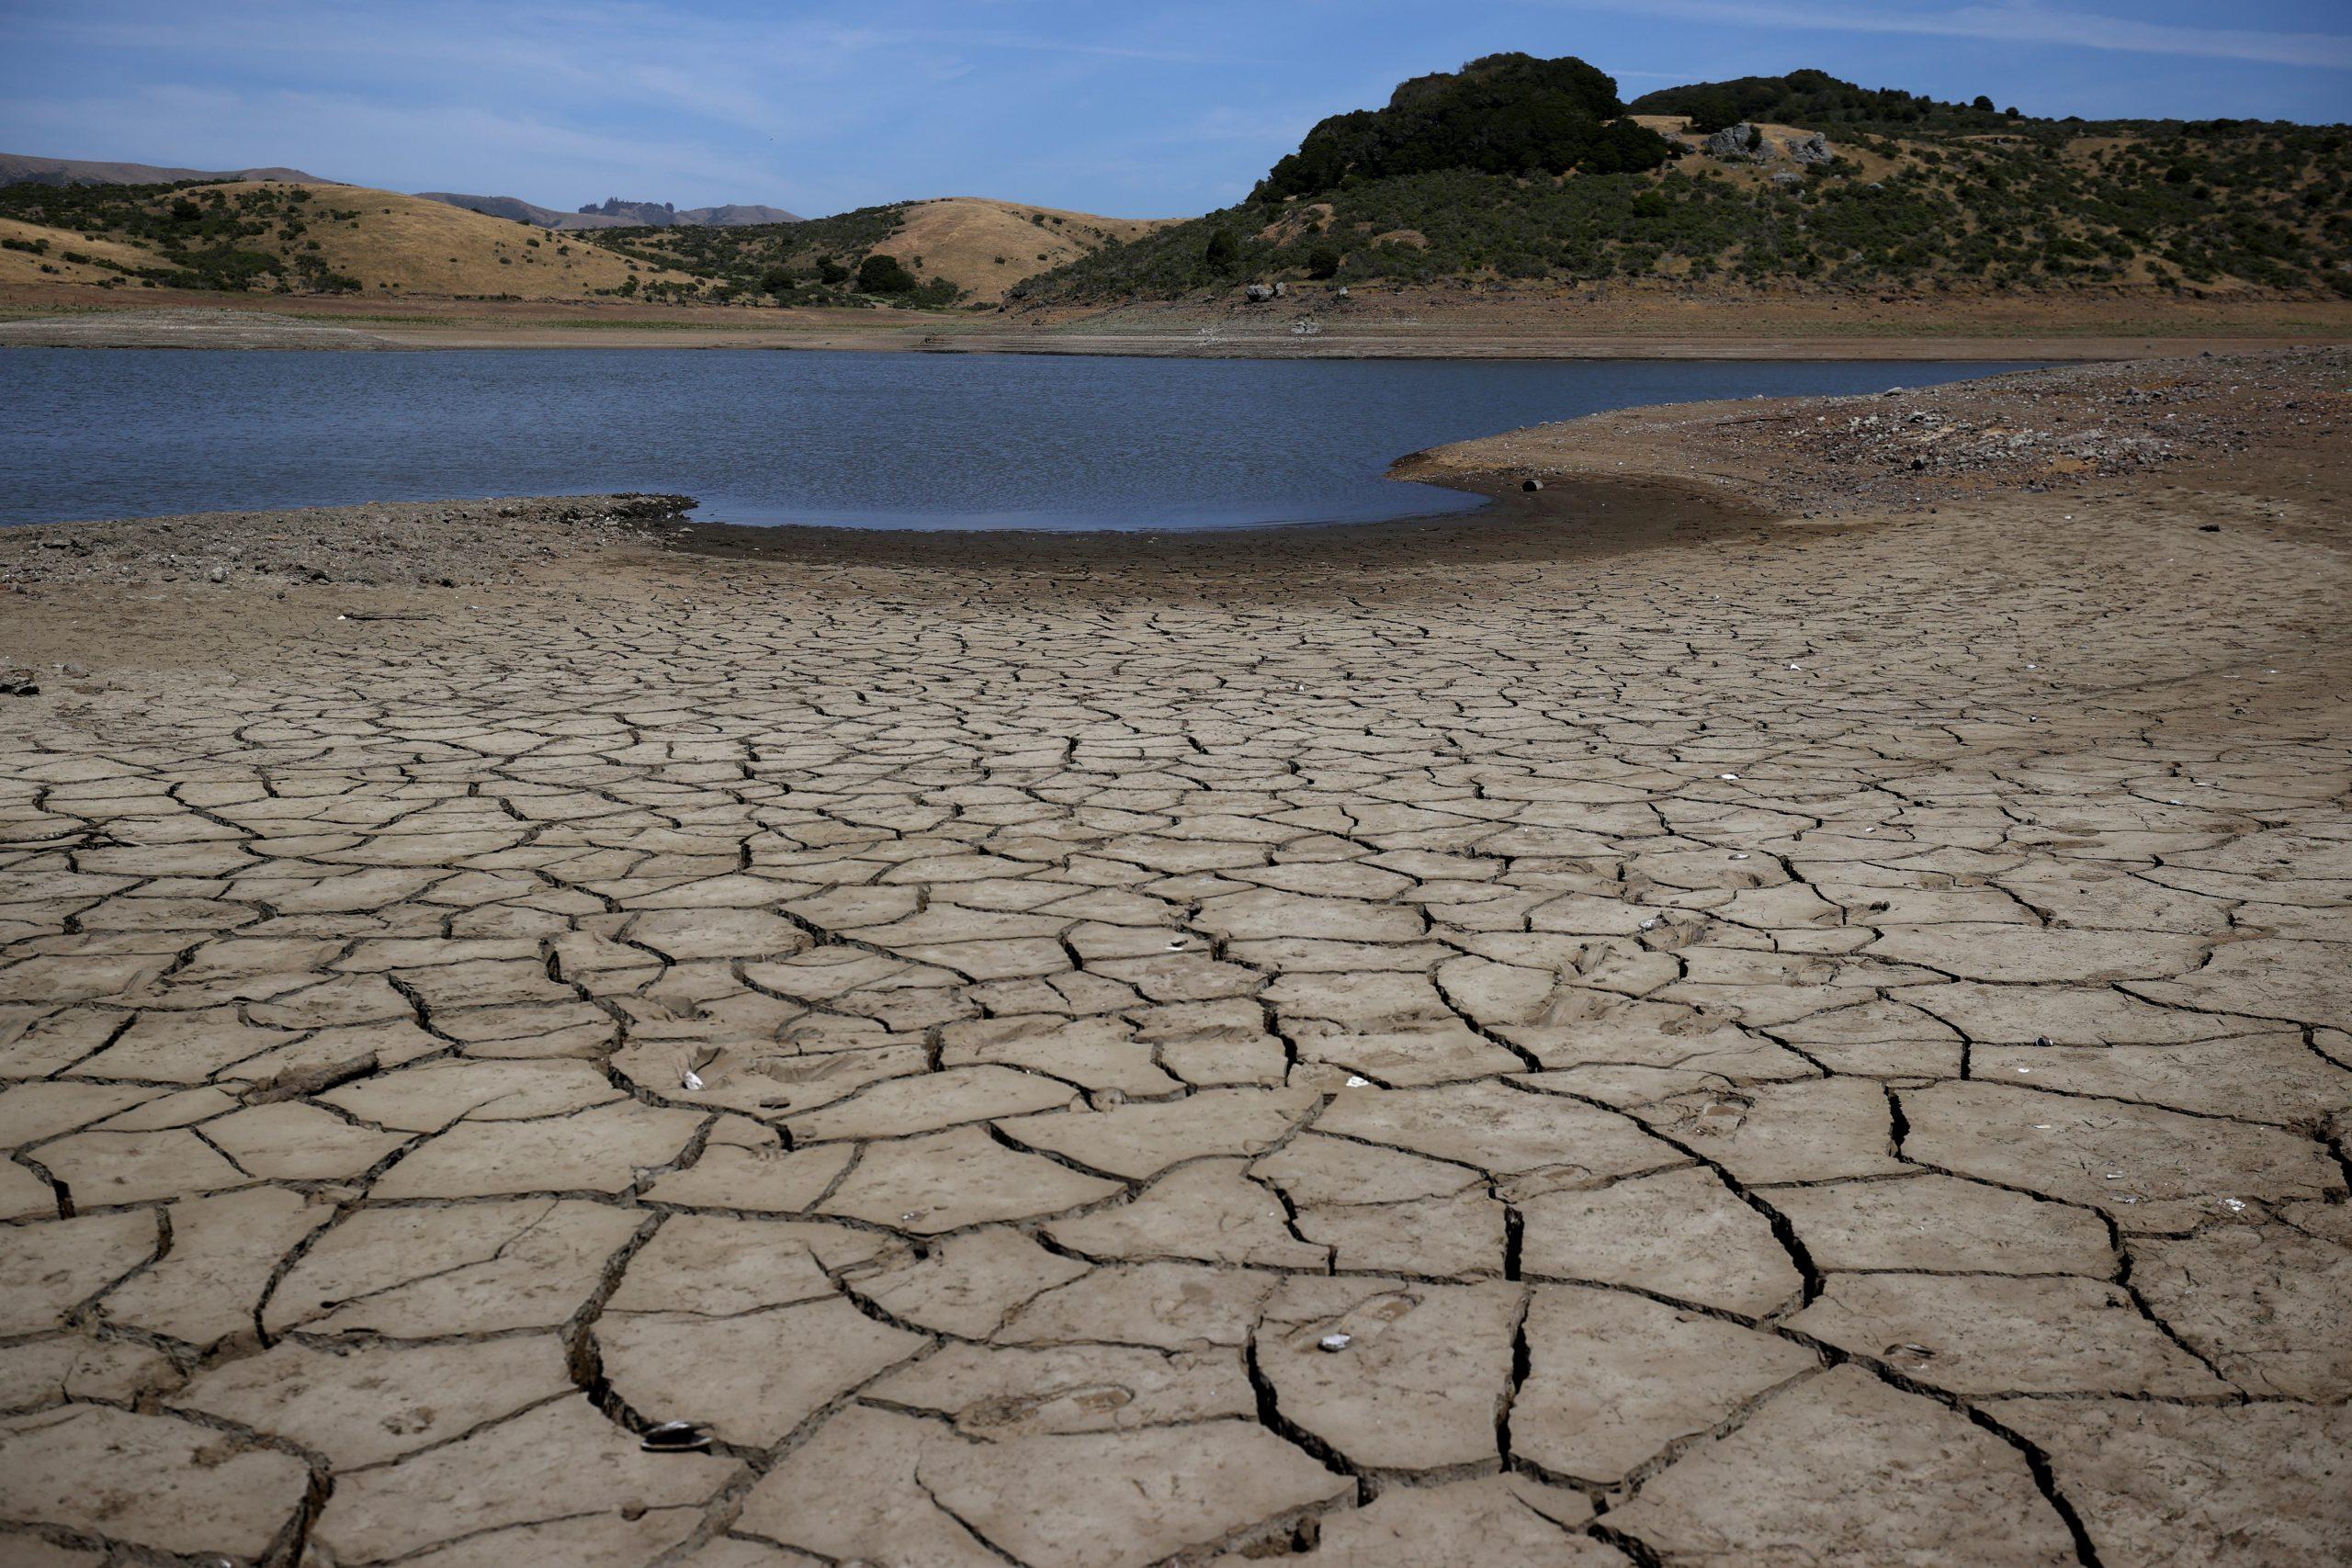 Western U.S. in Water Distress